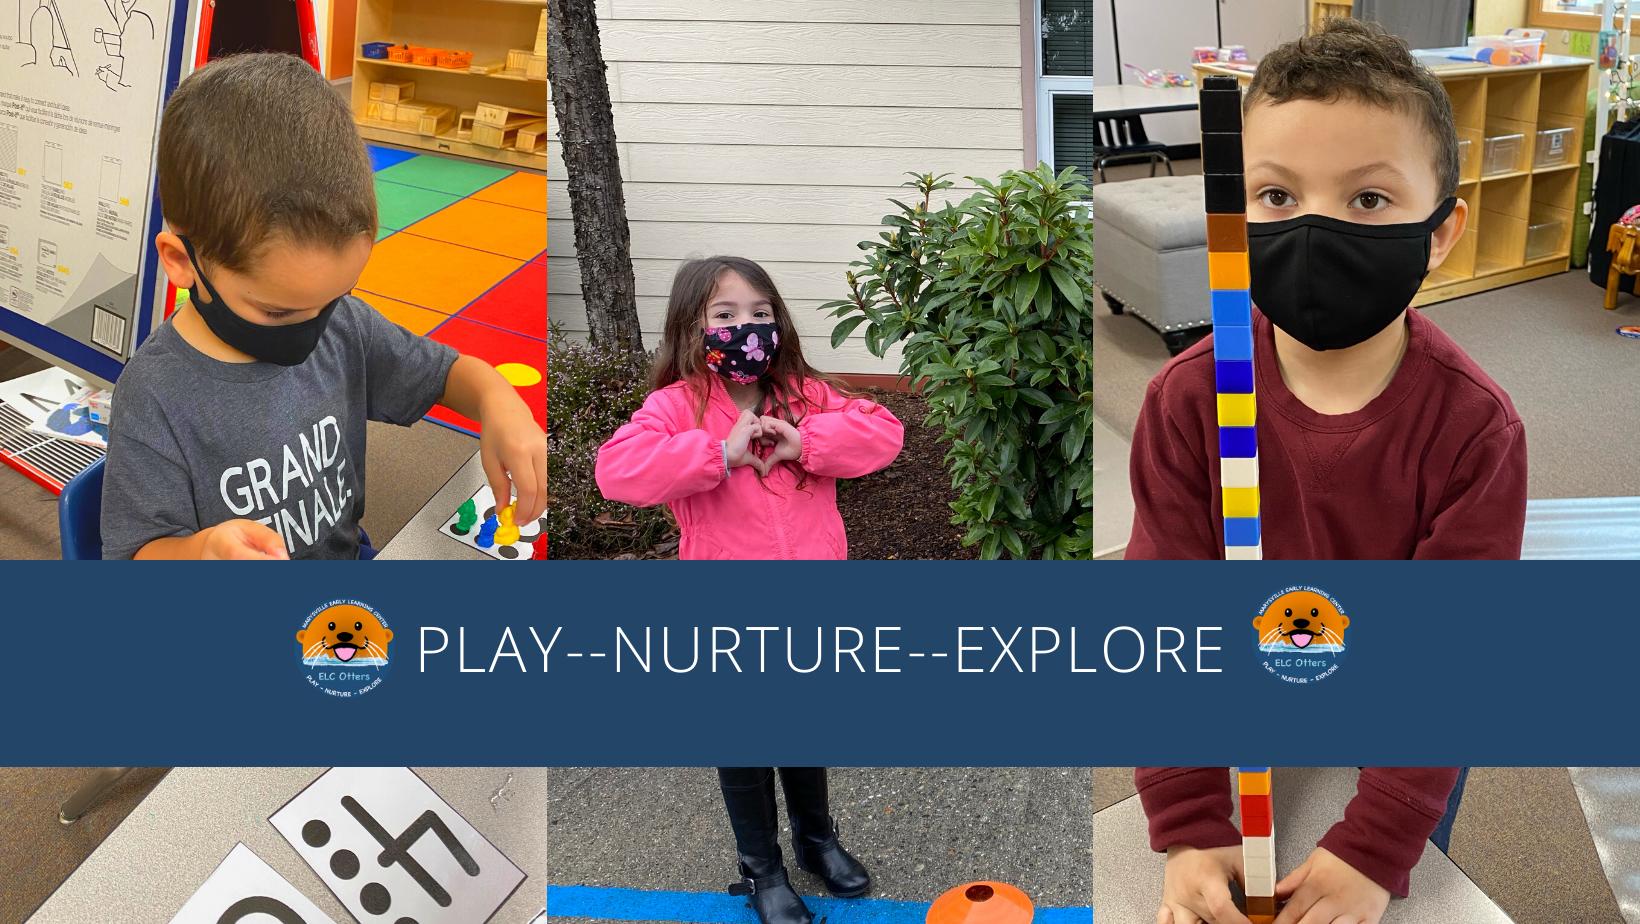 Play - Nurture - Explore